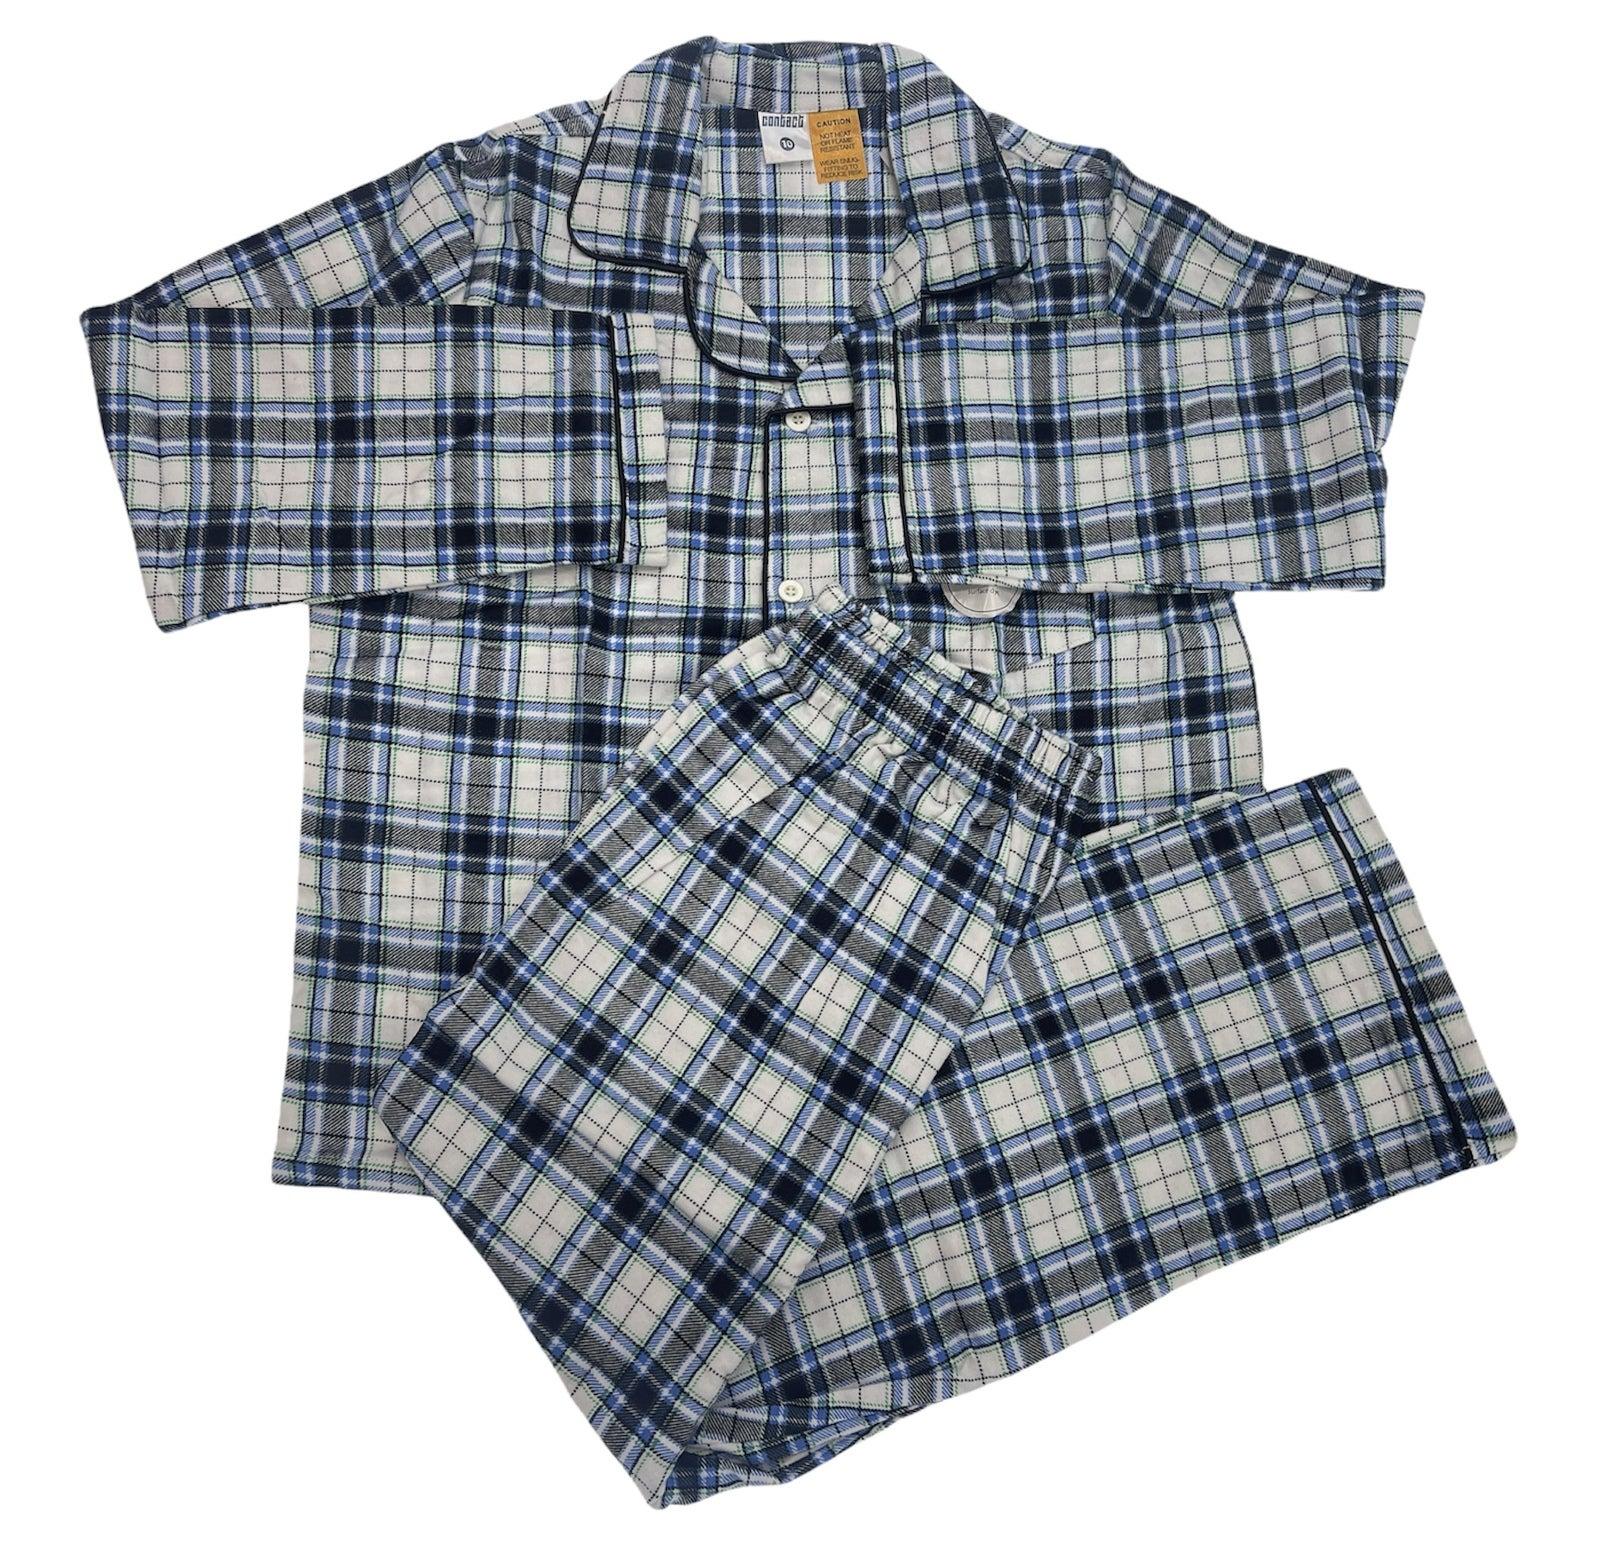 Laufschuhe einzigartiges Design erstklassige Qualität KIDS WINTER FLANNELETTE PYJAMAS PJs Boys Girls Flannel Pajamas Pyjama Set PJ